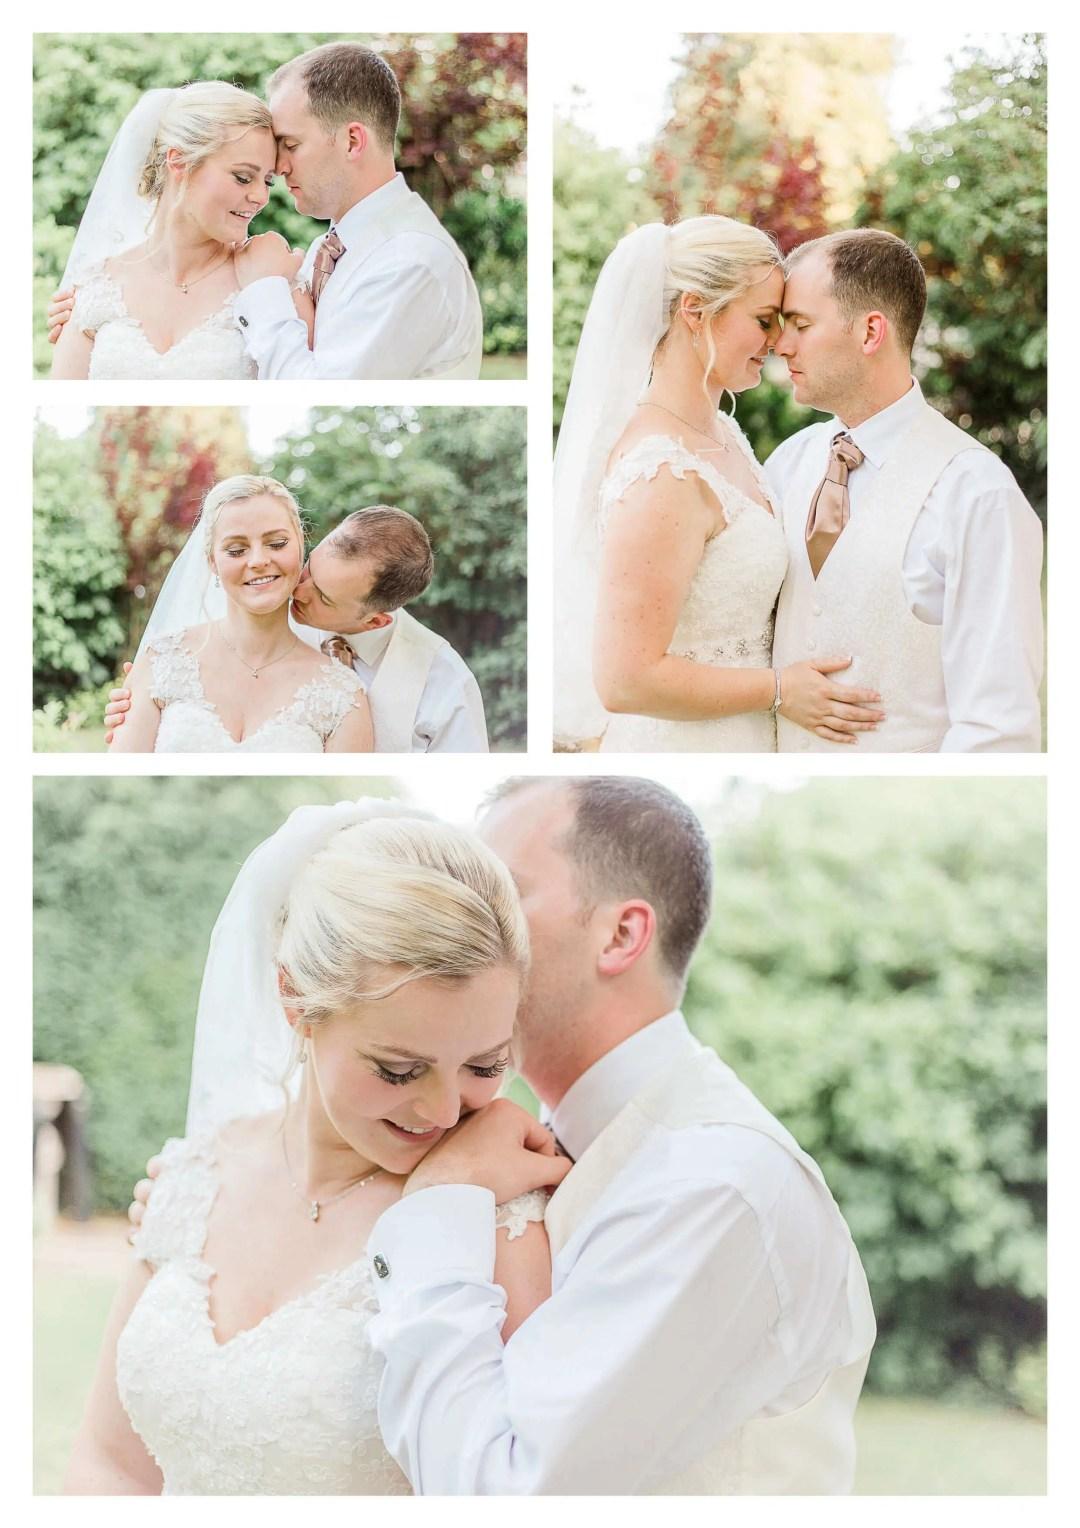 Tithe Barn at Mercure Box Hill Burford Bridge Hotel wedding portraits | Surrey Photographer